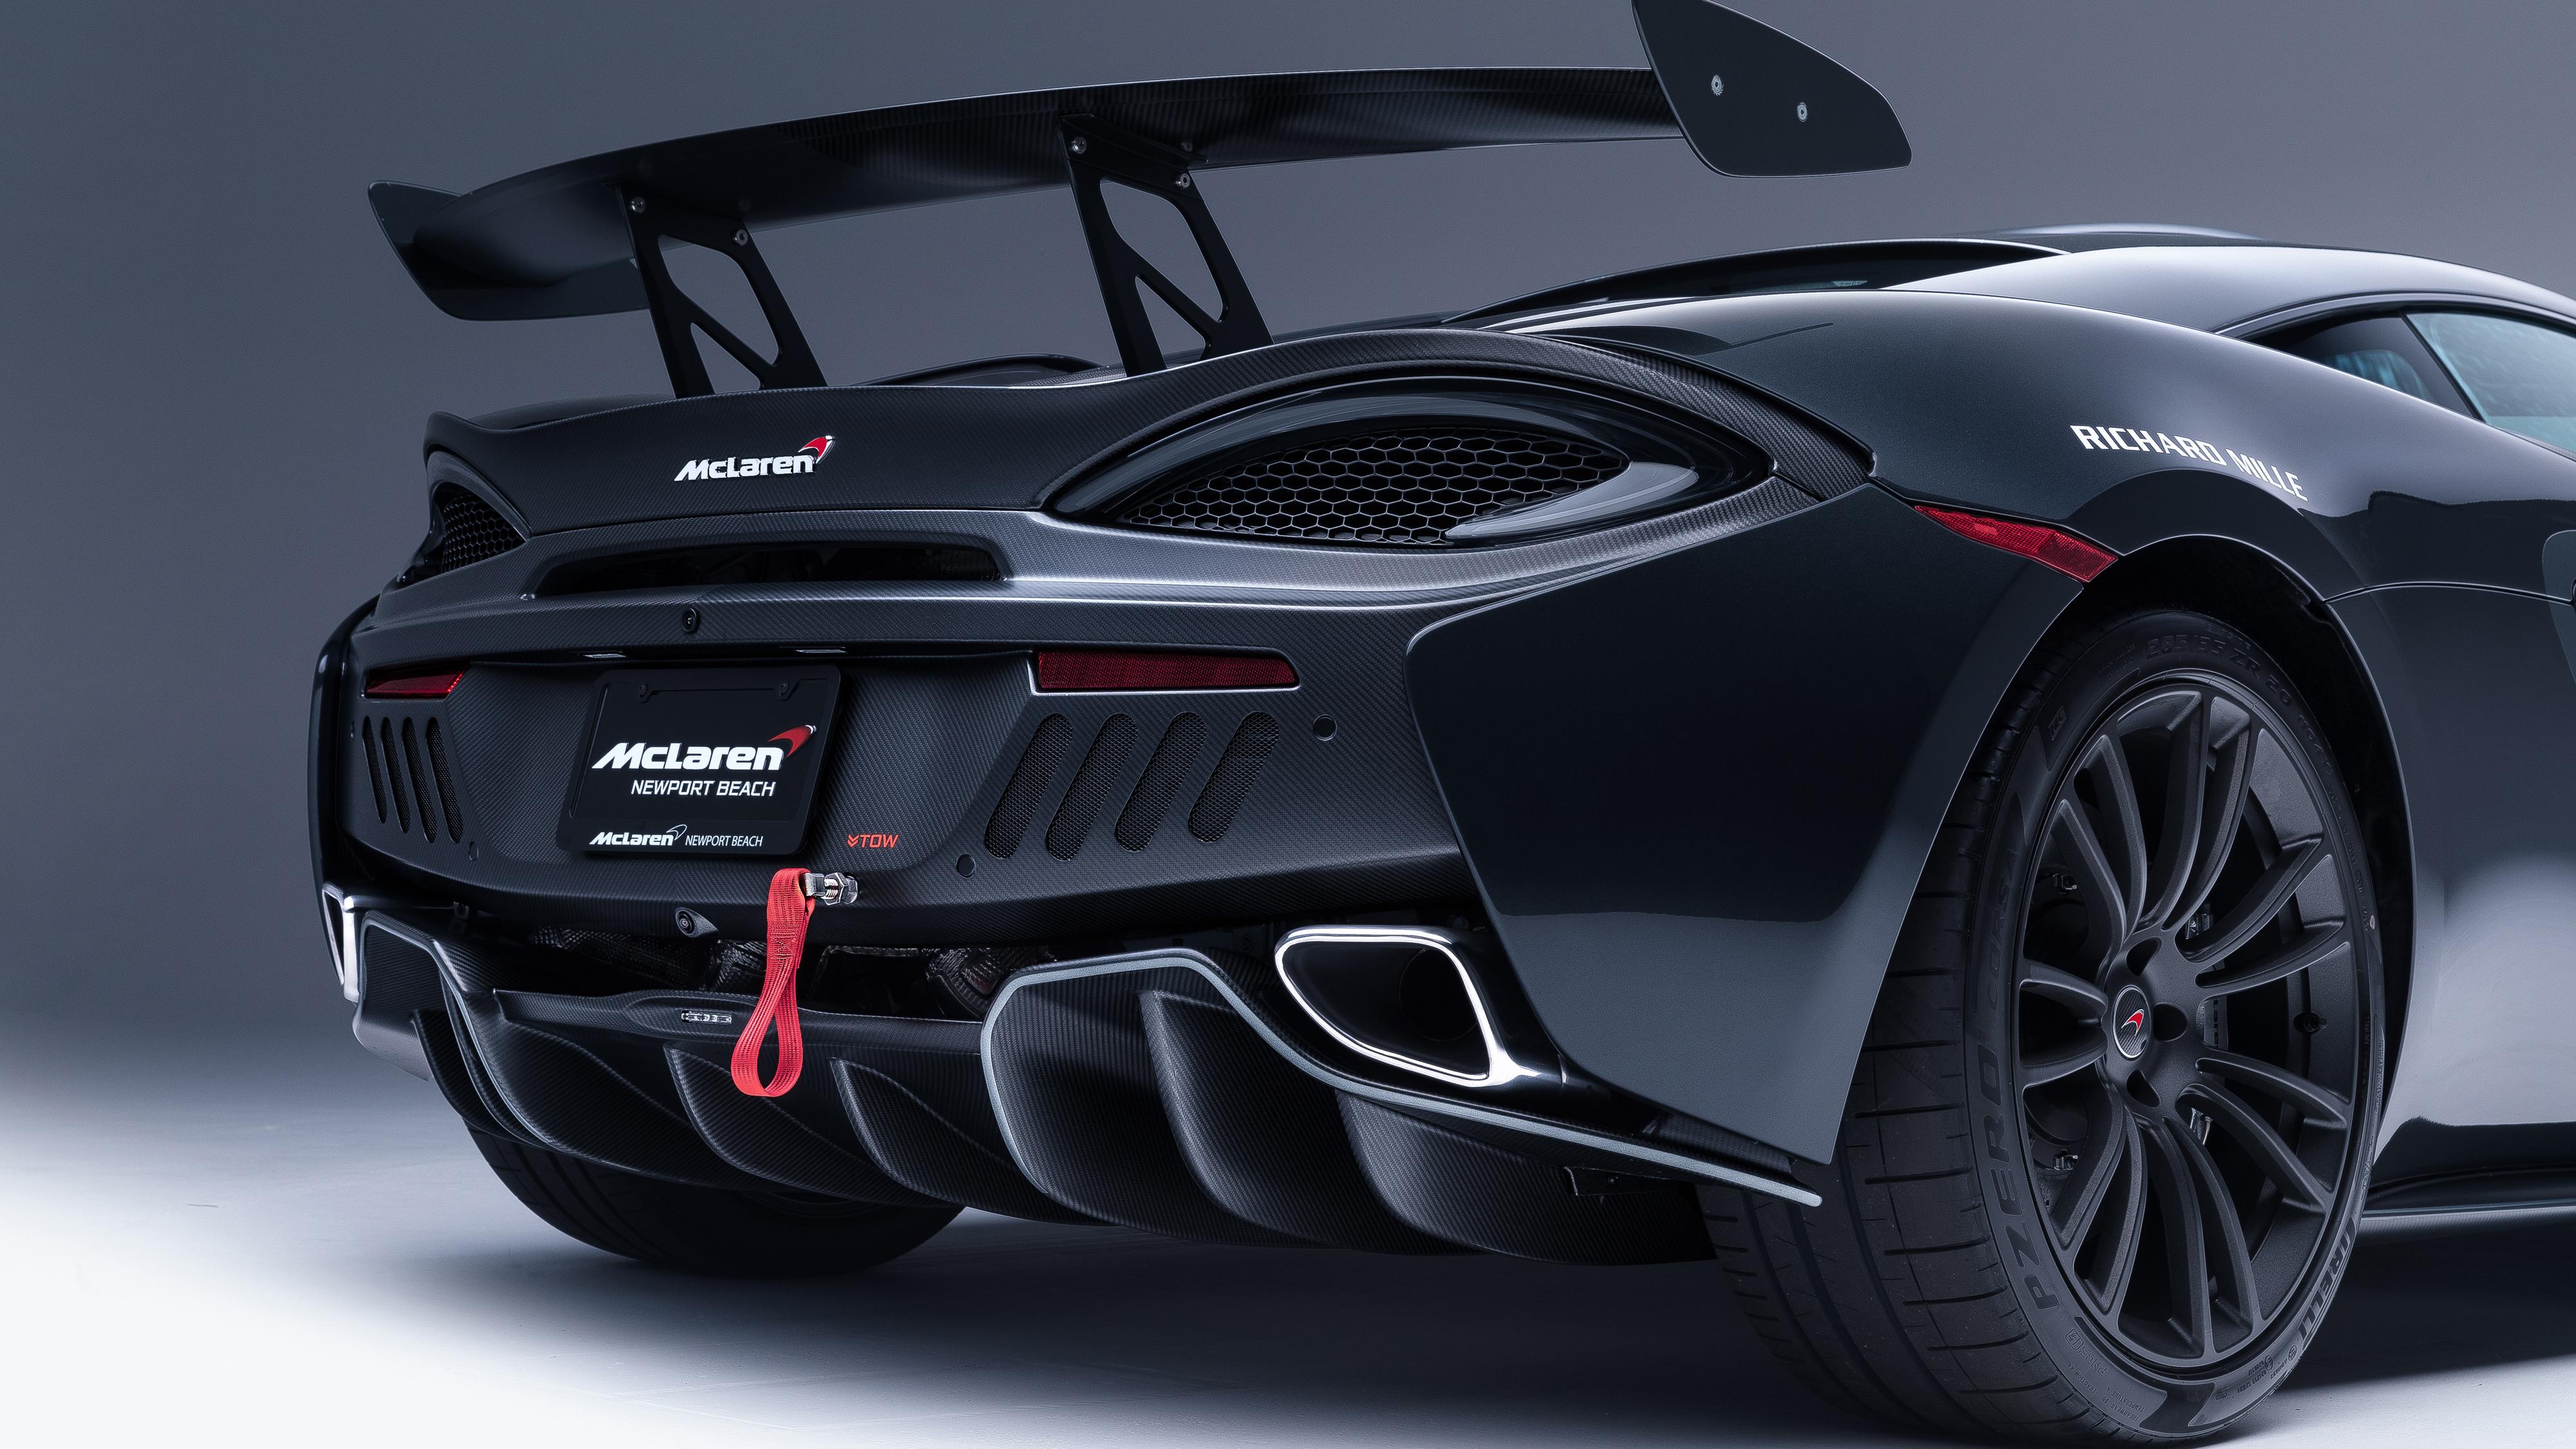 2018 McLaren MSO 10 Grey Black 5K 4 Wallpaper | HD Car ...